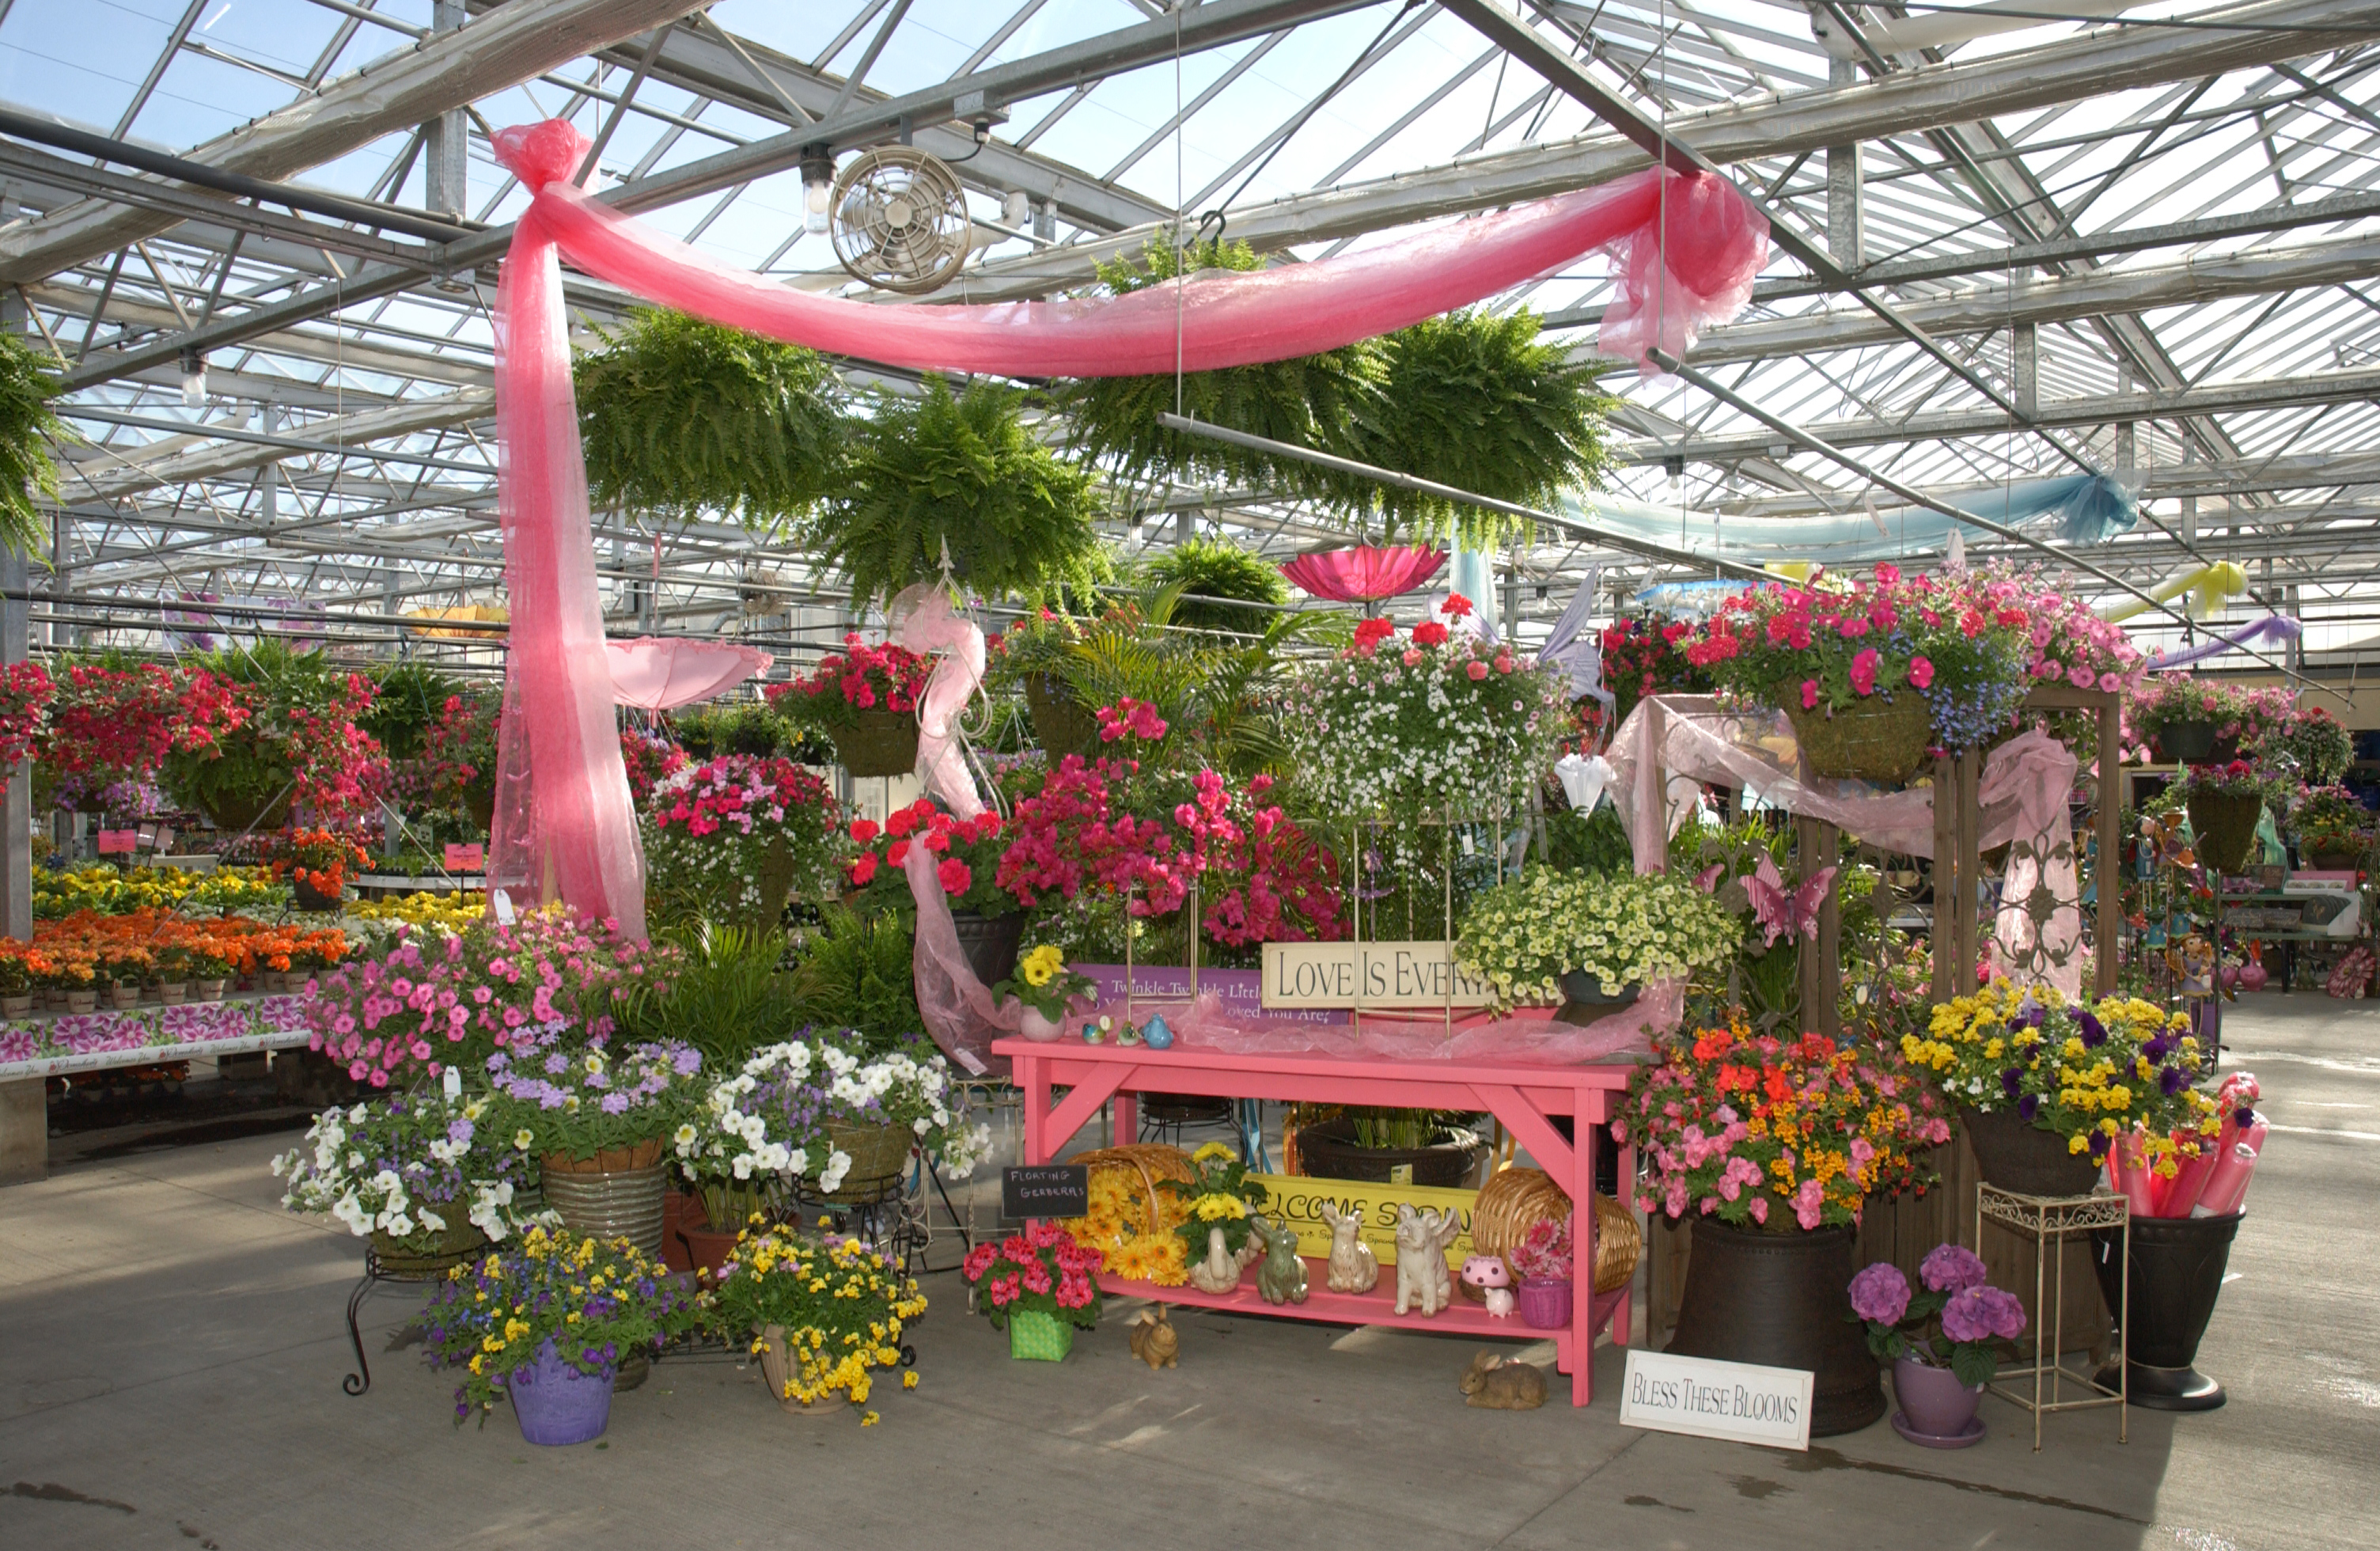 Retail Spring – Donahue's Greenhouse on grandio greenhouses, custom greenhouses, farmtek greenhouses, alaska greenhouses, low-priced greenhouses, residential greenhouses, timber greenhouses, gothic arch greenhouses,